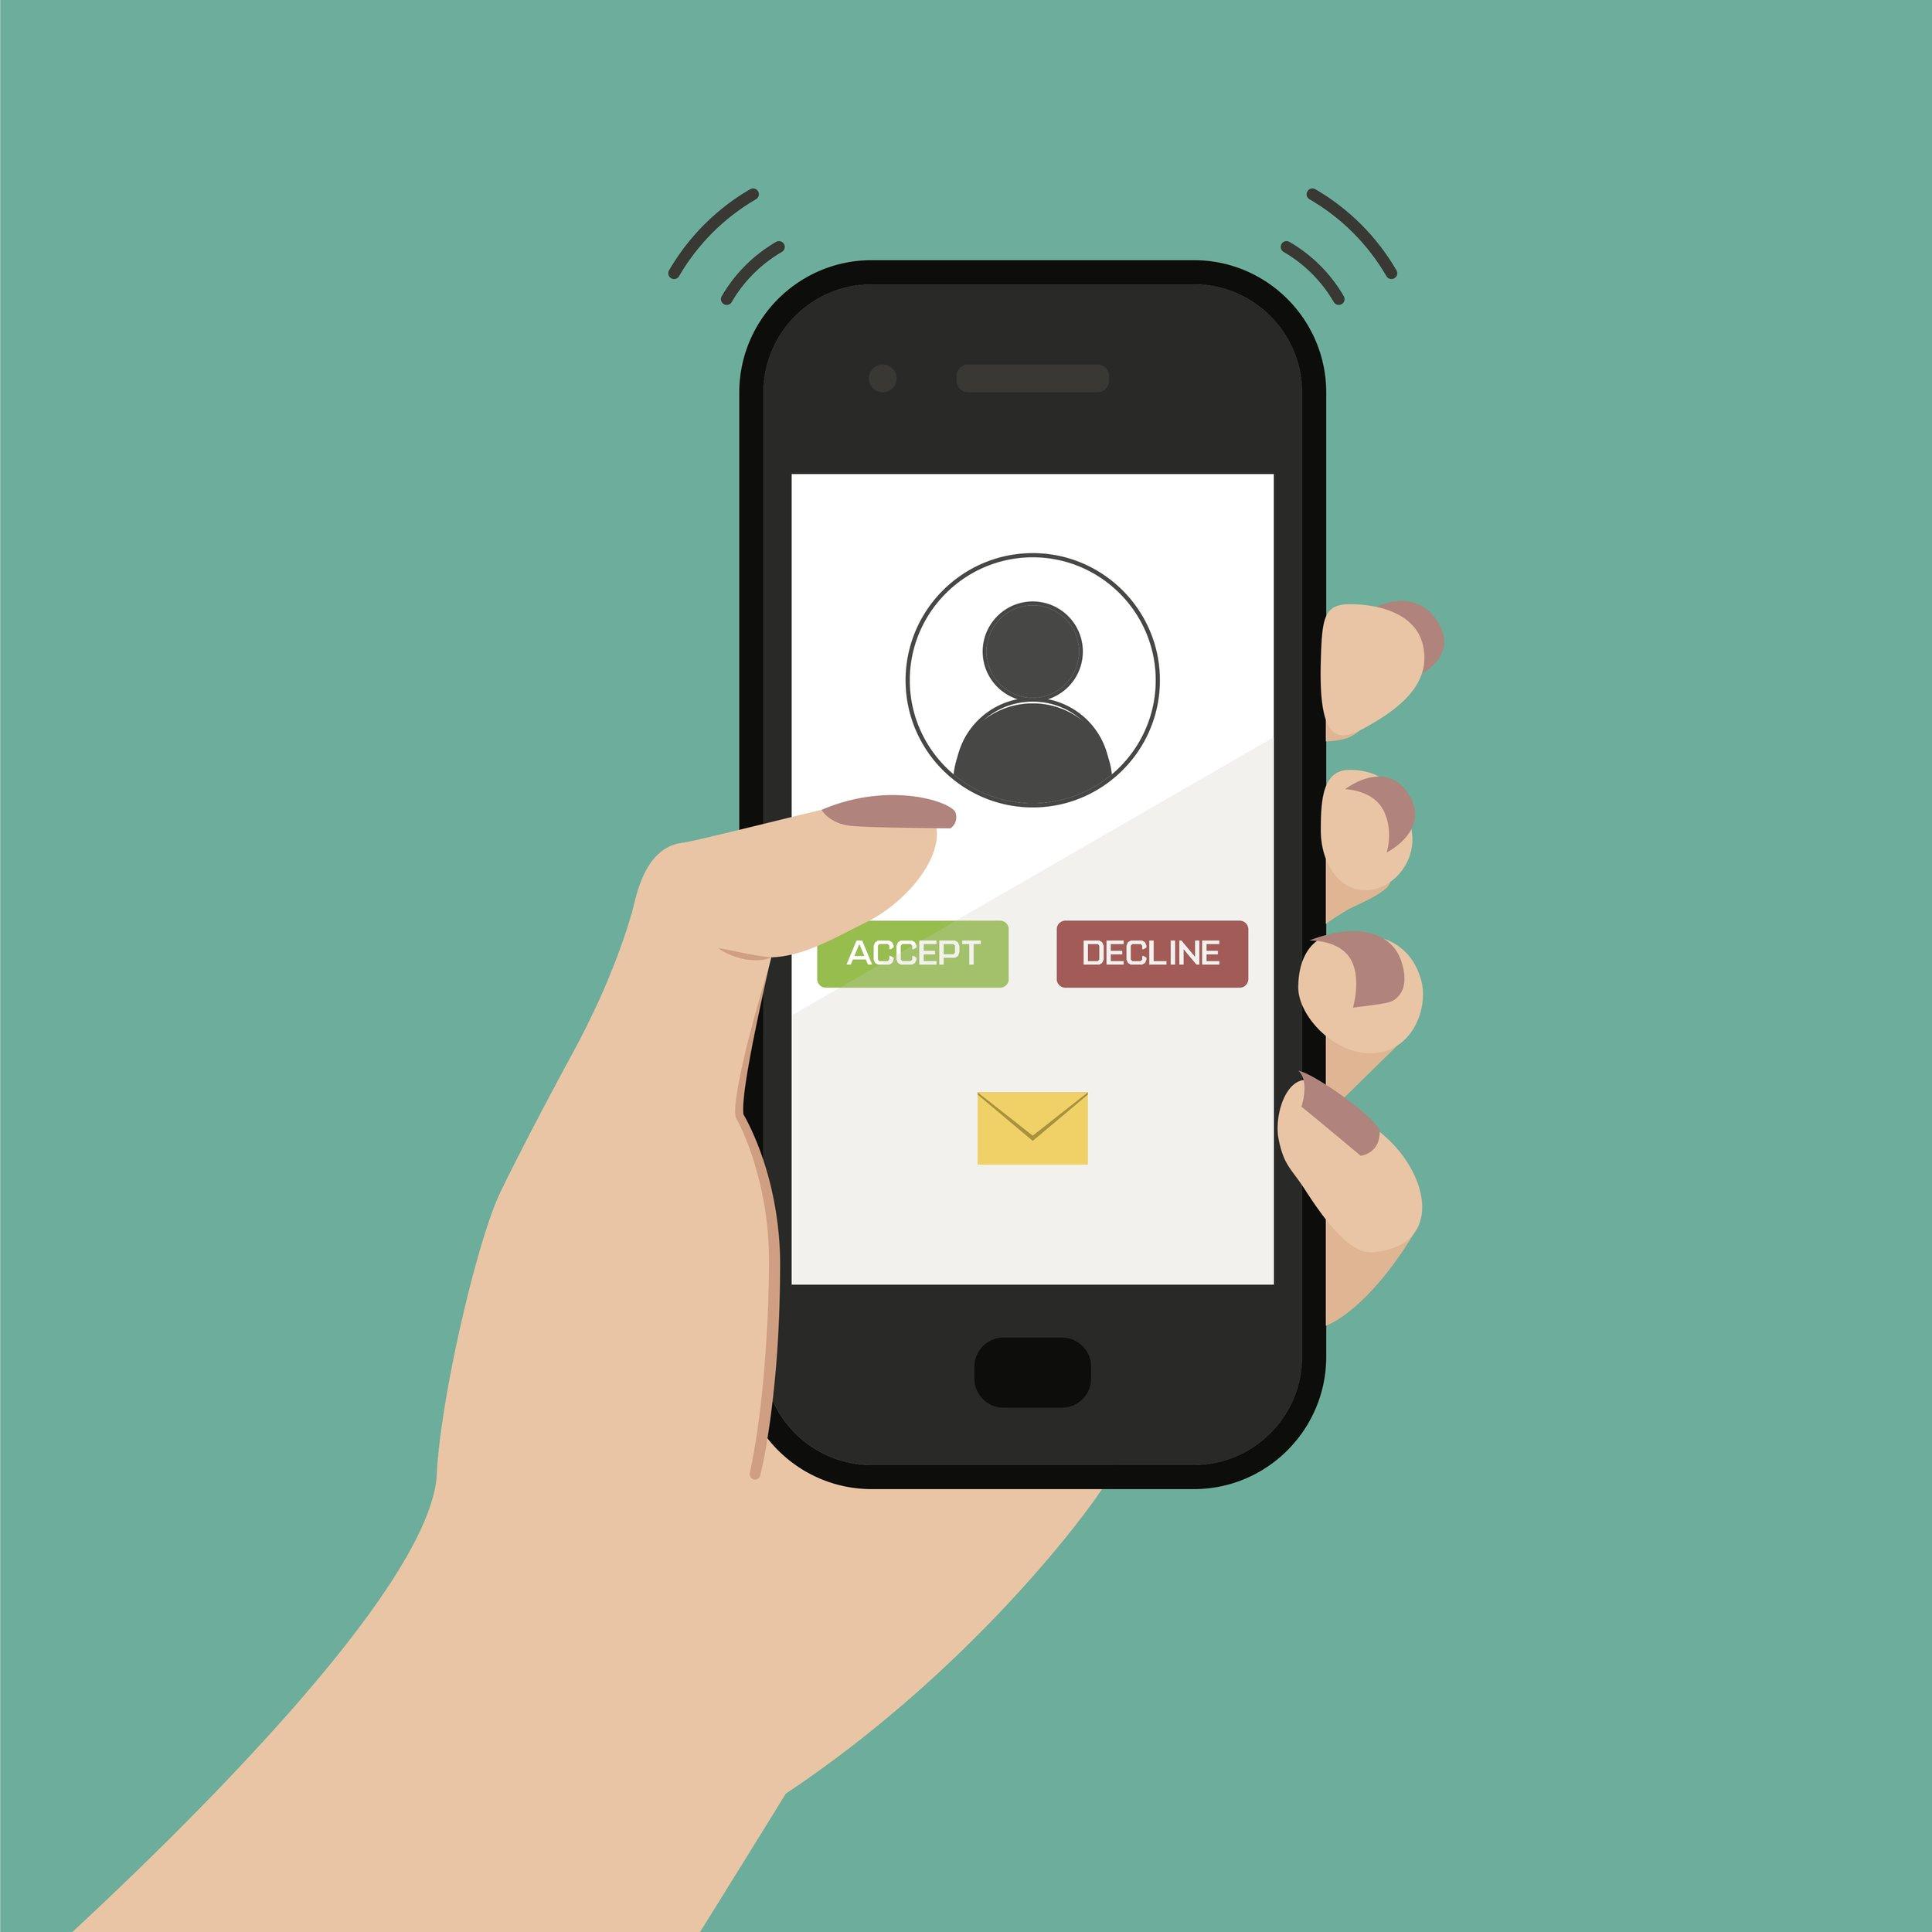 Receiving-a-call-concept-906399862_4167x4167.jpg